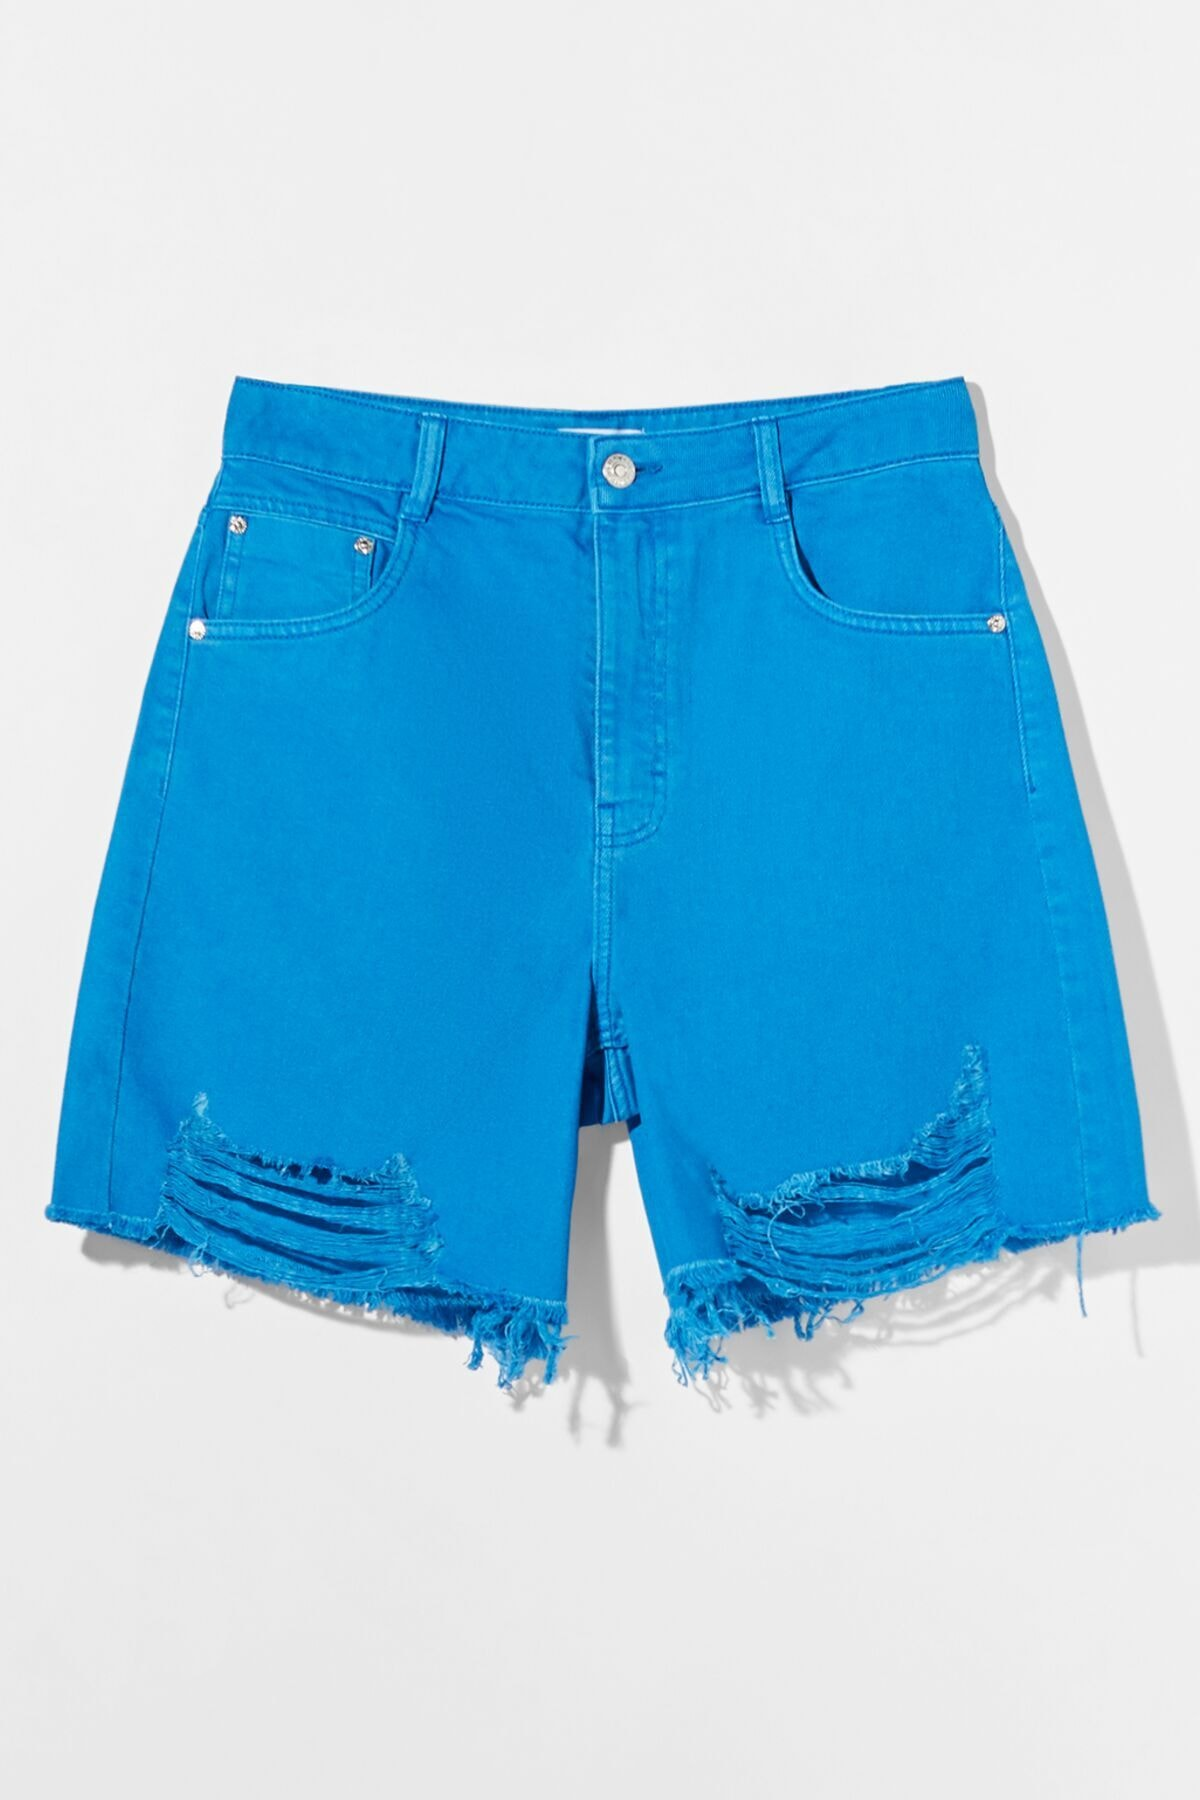 Bershka Kadın Mavi Distressed Fitilli Bermuda Şort 02676019 4